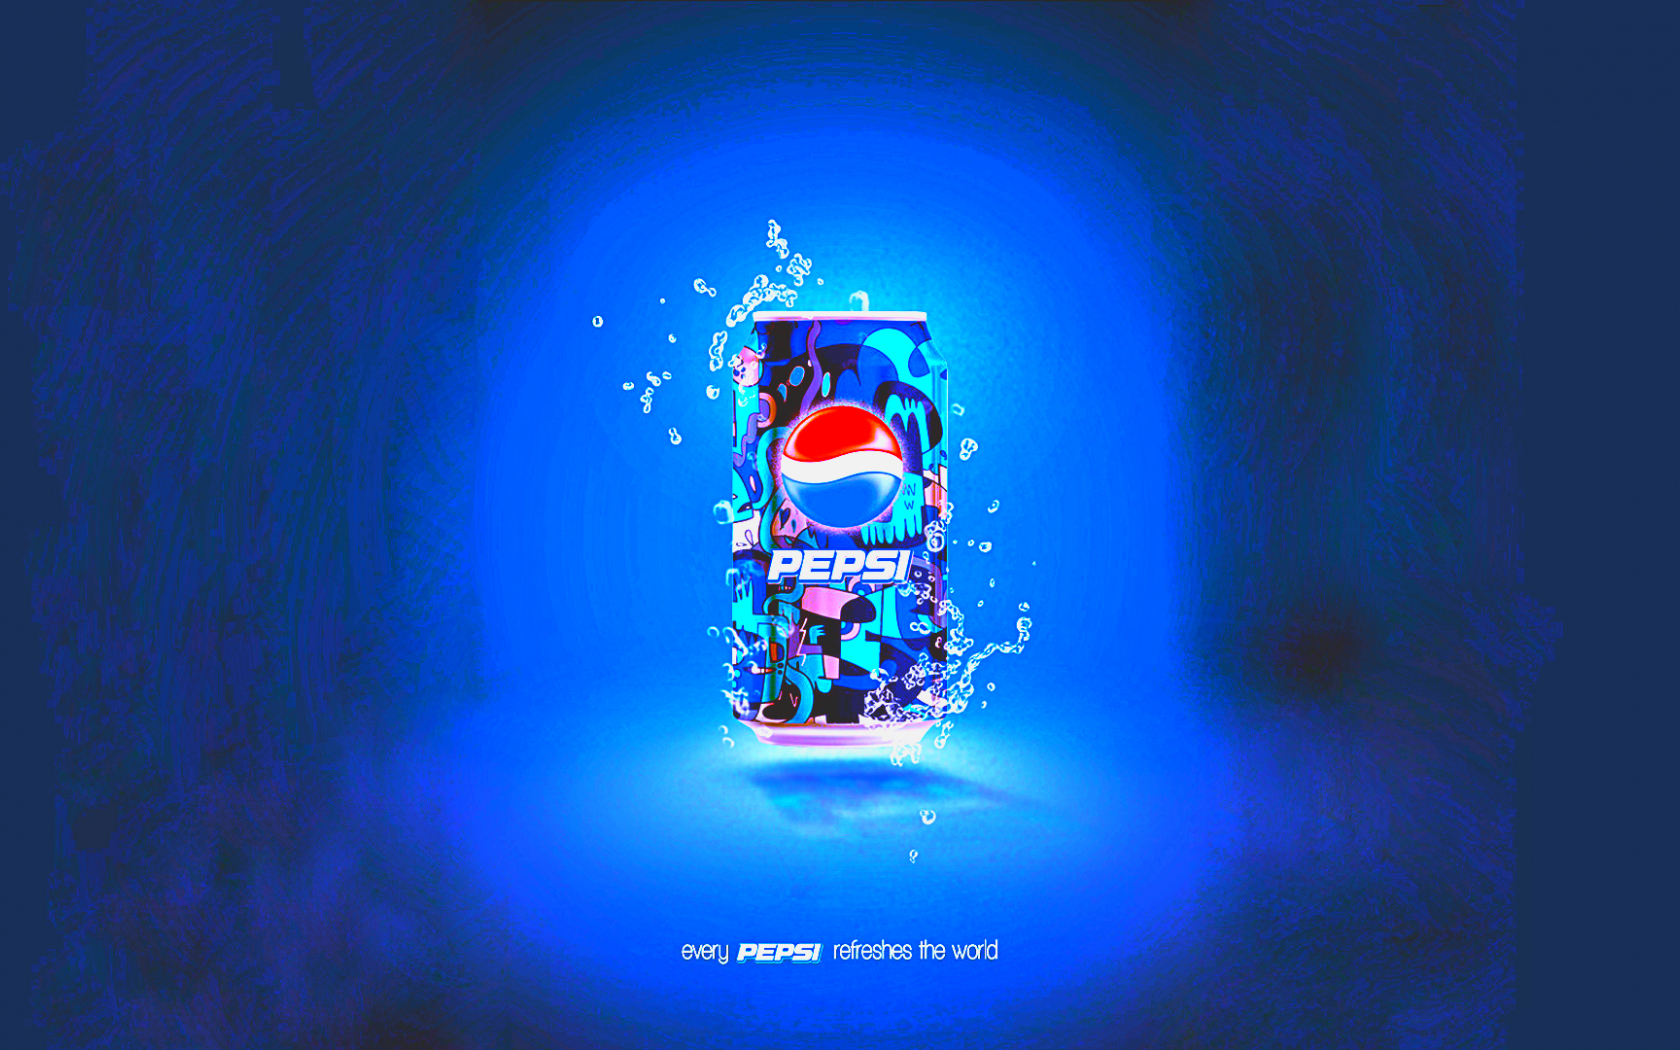 Free Download Pepsi Widescreen Hd Wallpapers Pepsi Ipl Logo Pepsi